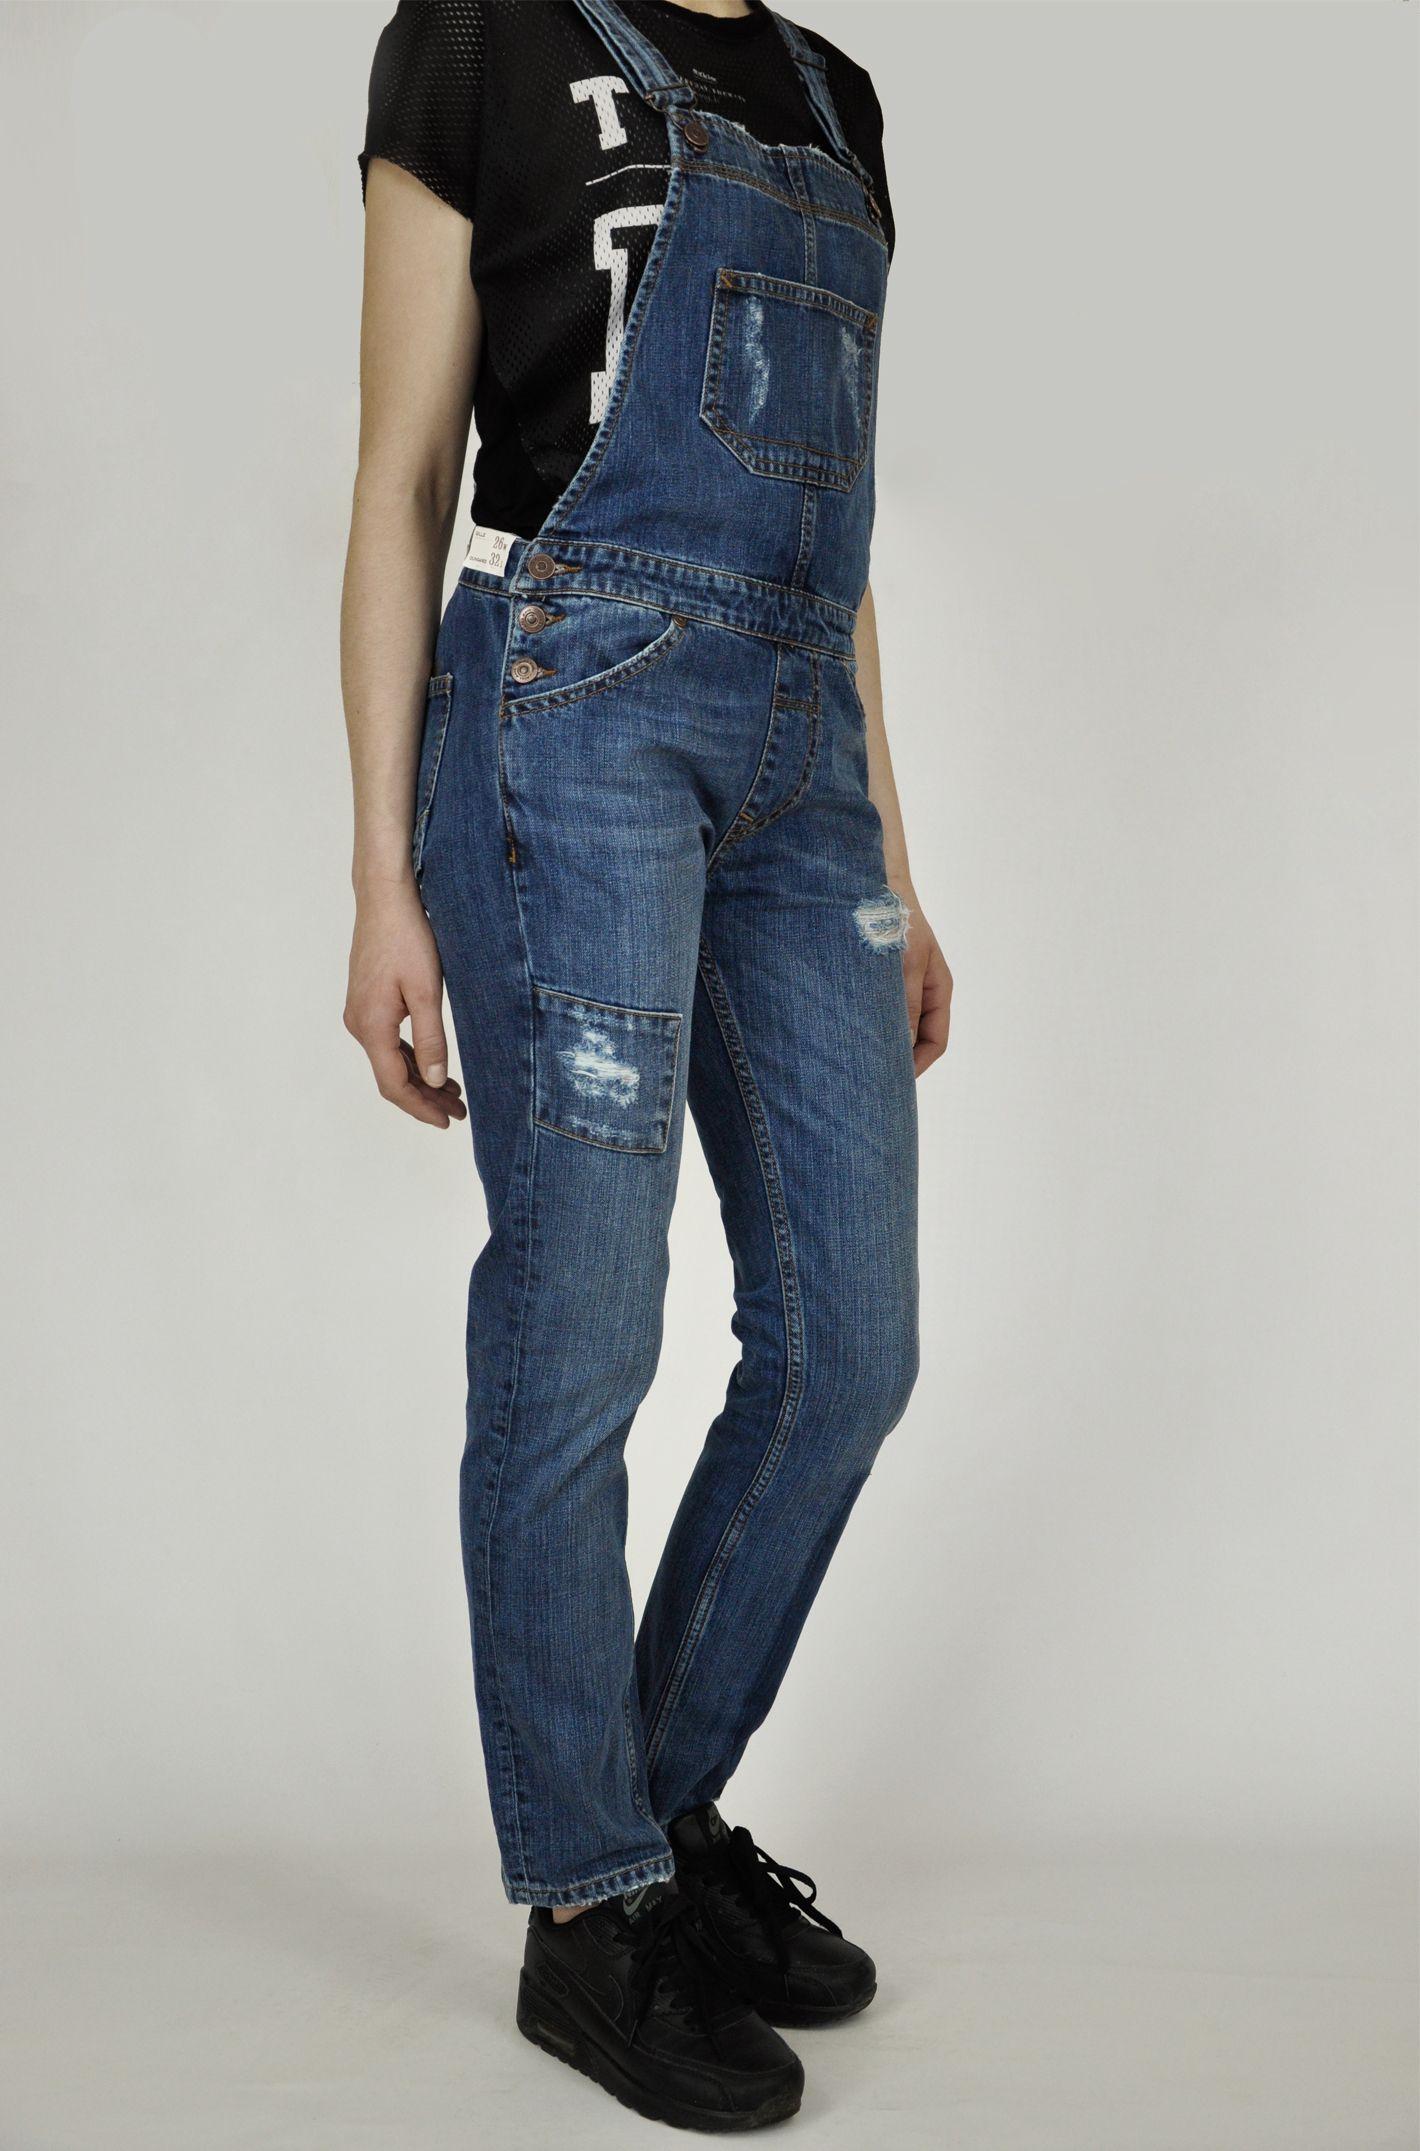 Pin On Moda Damska Cross Jeans Fashion For Women Texas Club